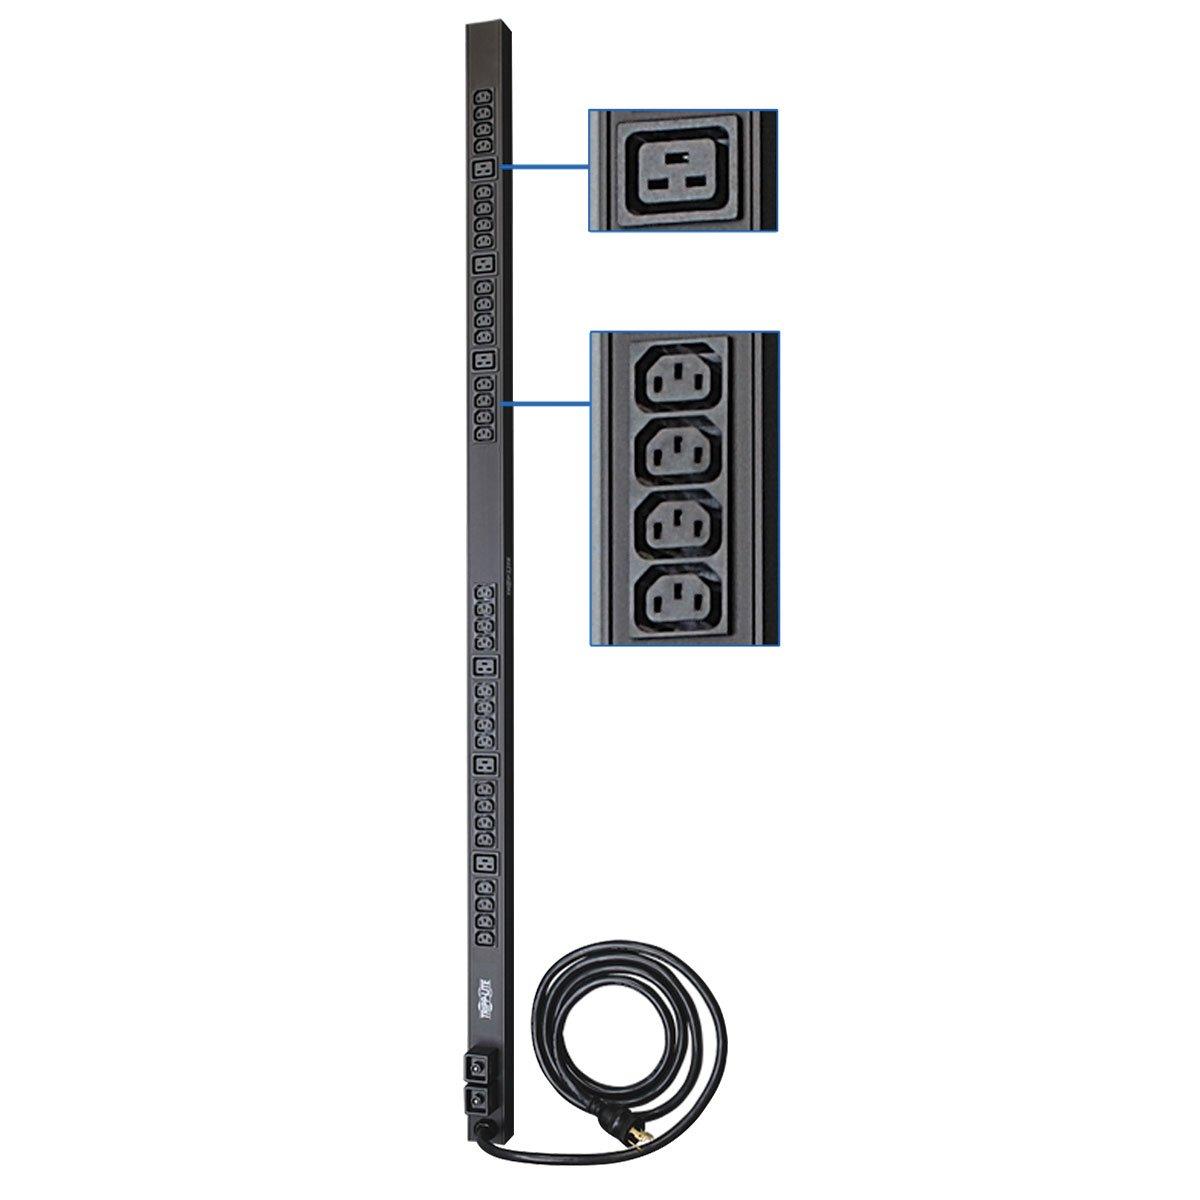 Tripp Lite Metered Pdu 30a 30 Outlets 6 C19 24 C13 20p To Nema 20r X 3 208 240v L6 30p 10 Ft Cord 0u Vertical Rack Mount Power Pdumv30hv Electronics